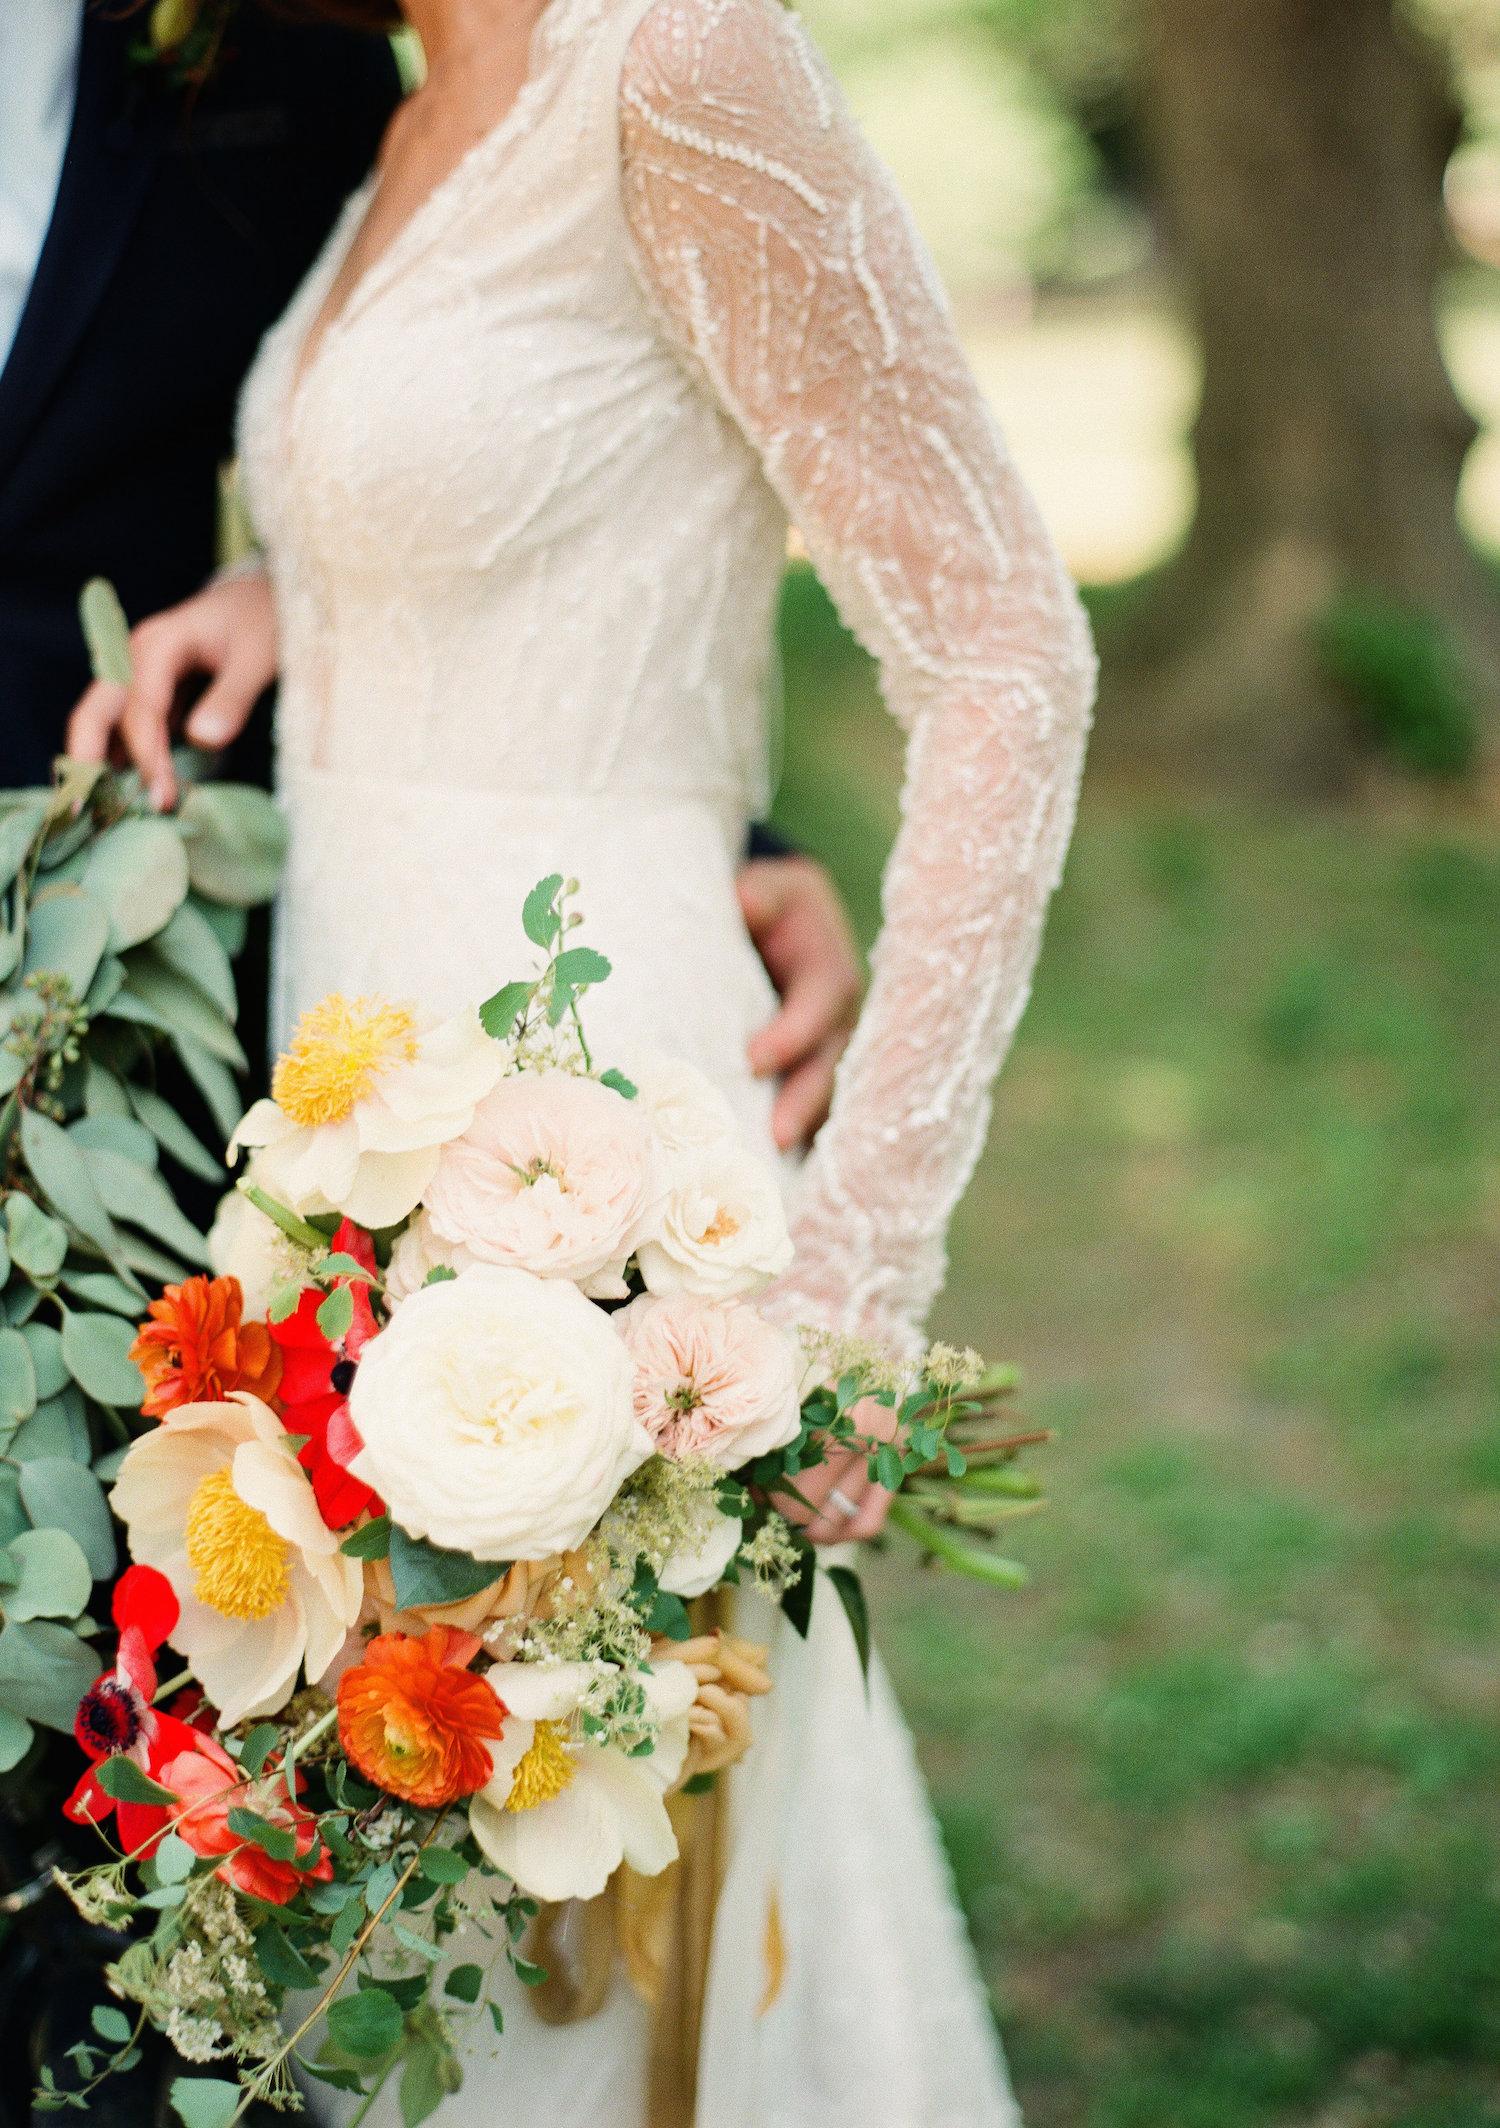 Morning Glow - Full Aperture Floral & Lindsay Madden Photography 126.jpeg